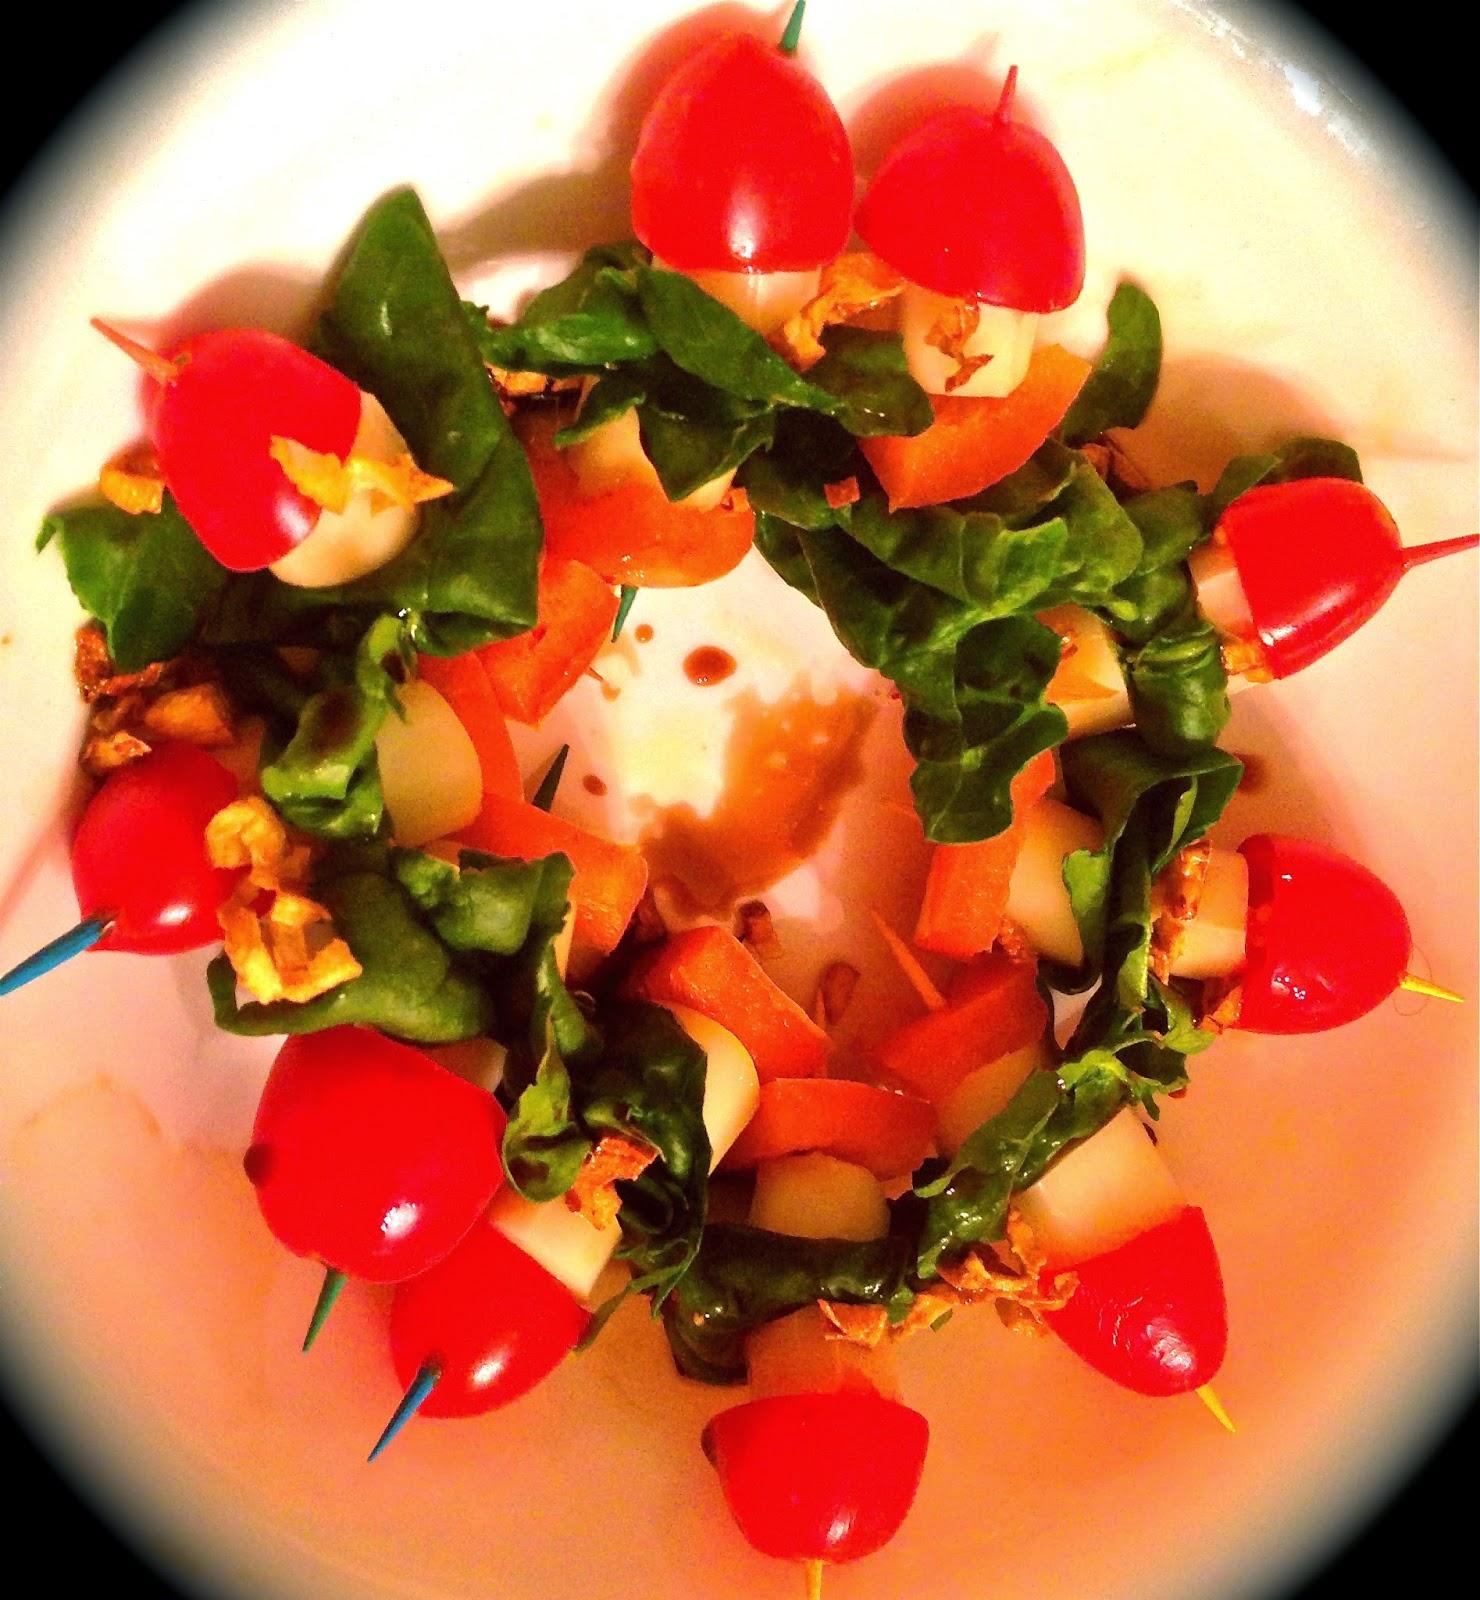 Cherry tomatoes, Mozzarella, Spinach, Pepper Bites